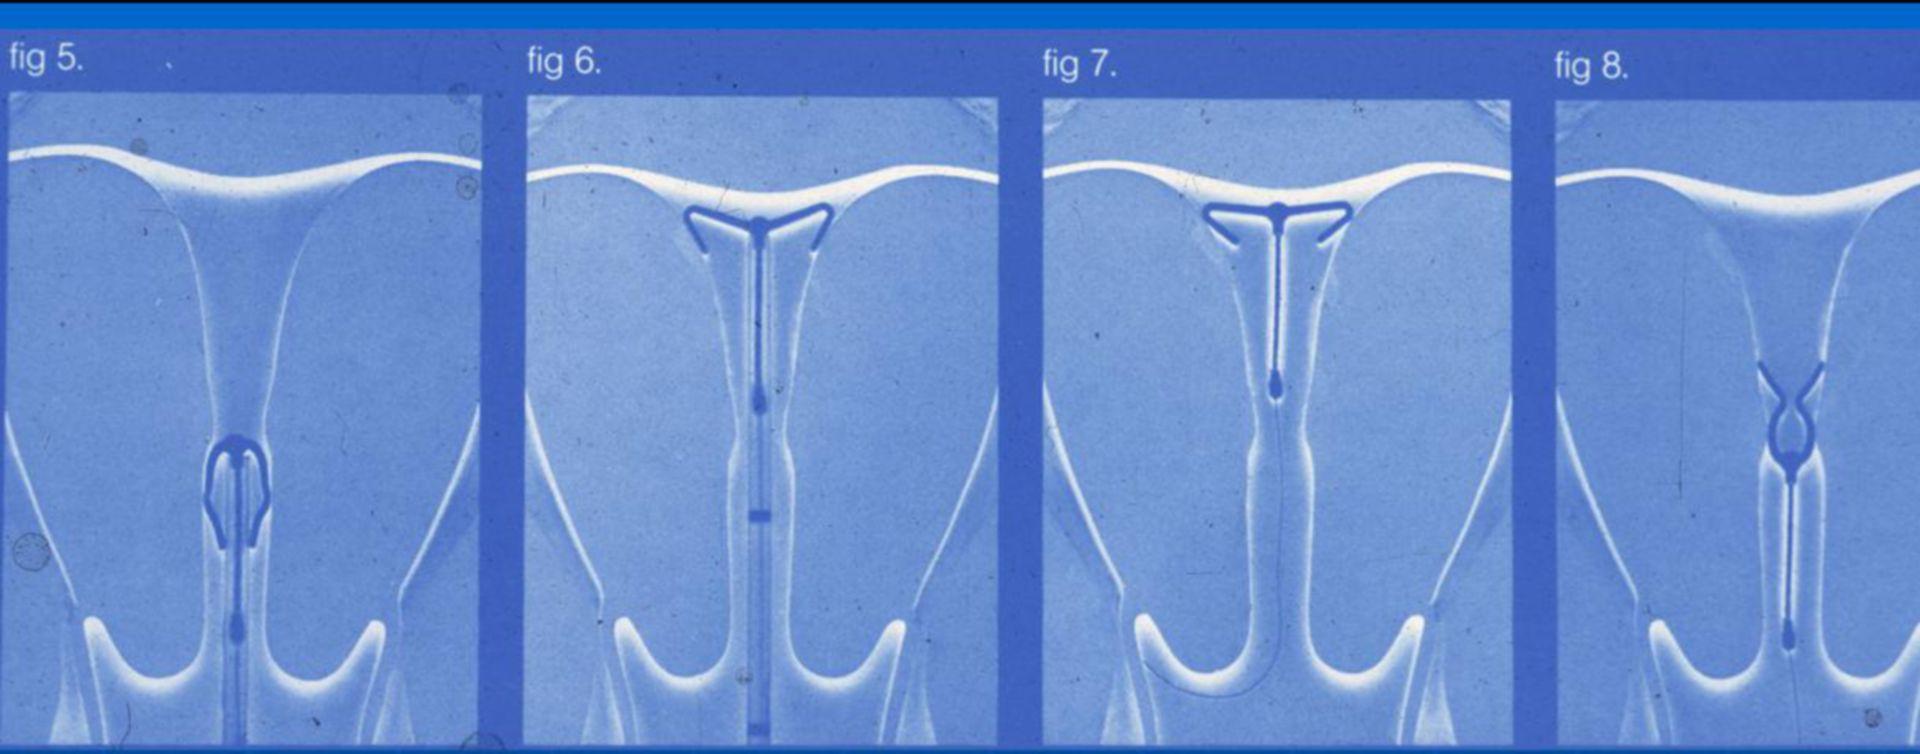 Flexi-T - Intra-Uterine Devices